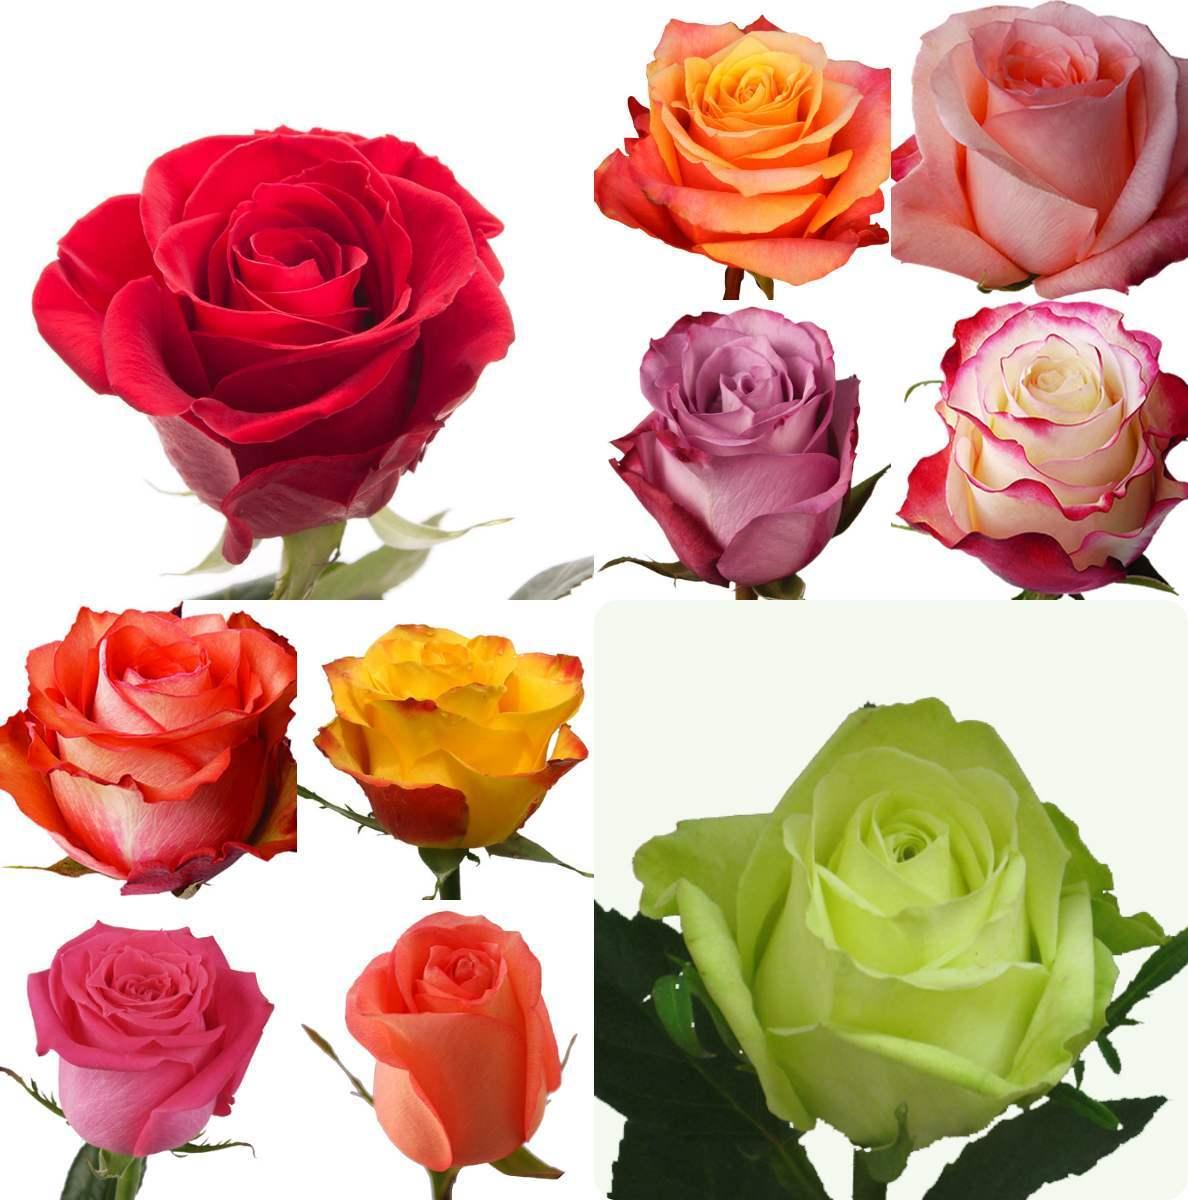 Trandafirii de Ecuador, o adevarata marca in domeniu